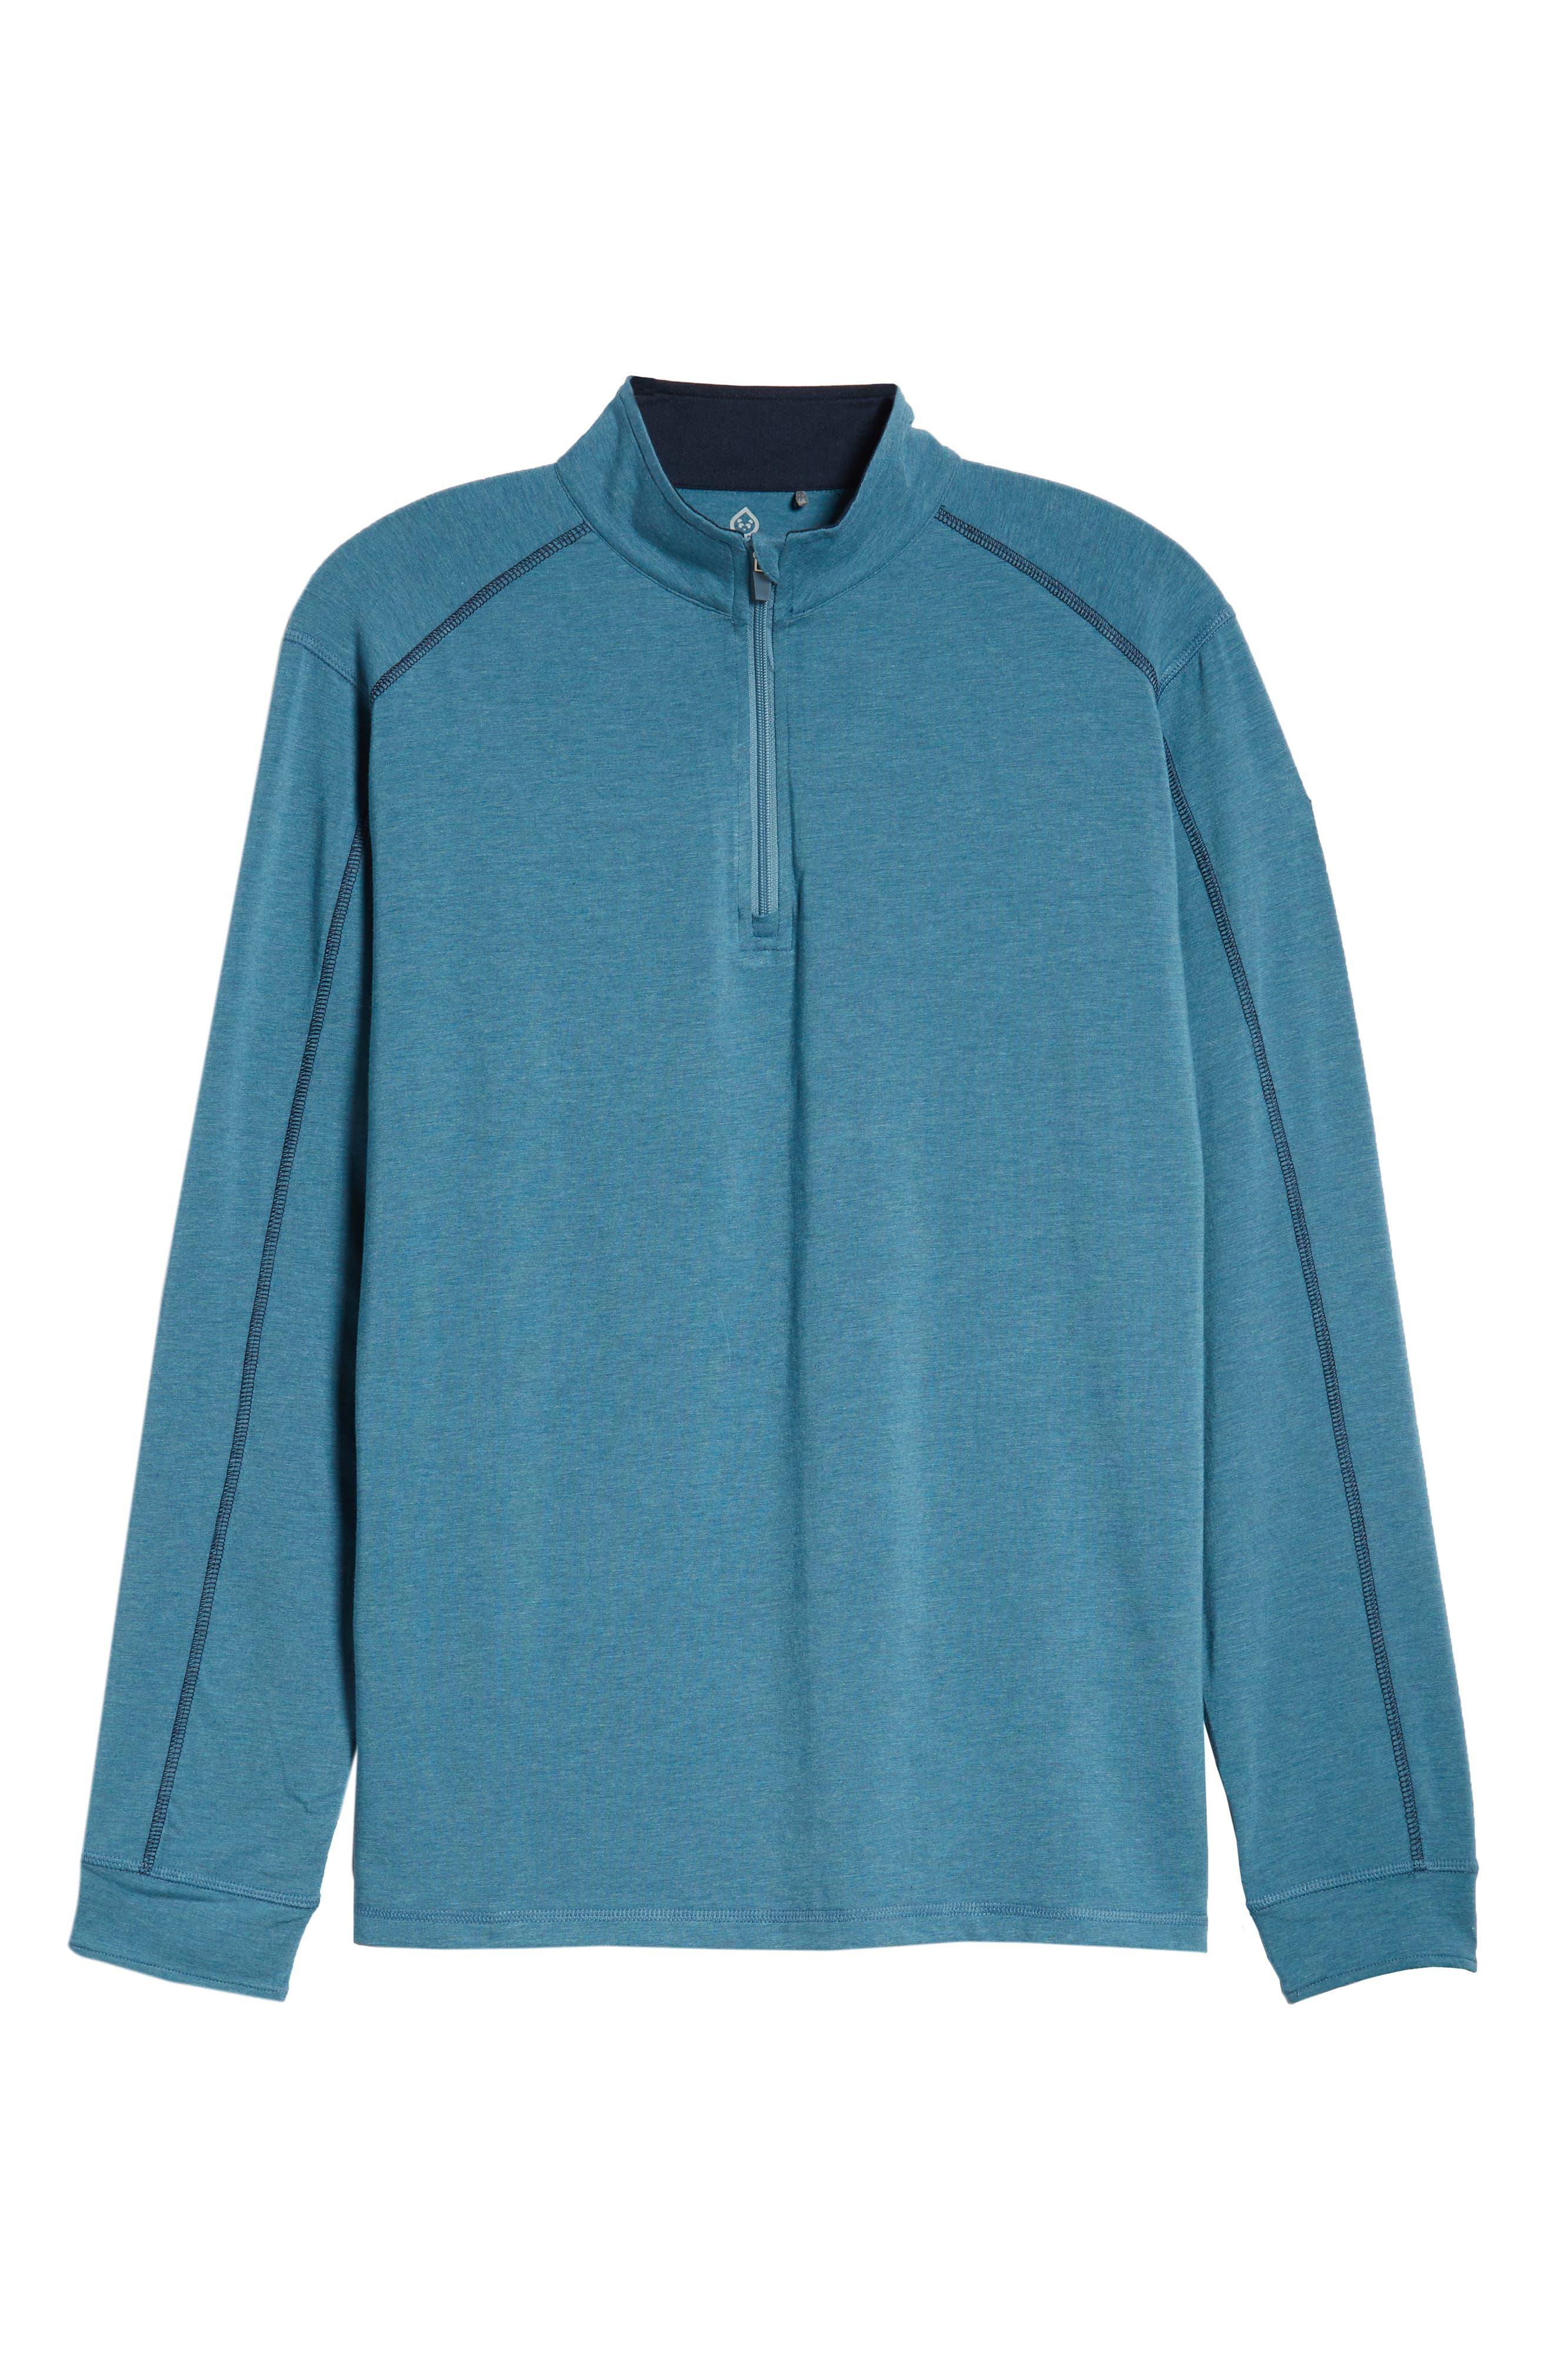 Carrollton Quarter Zip Sweatshirt,                         Main,                         color, Tranquility Sea Heather